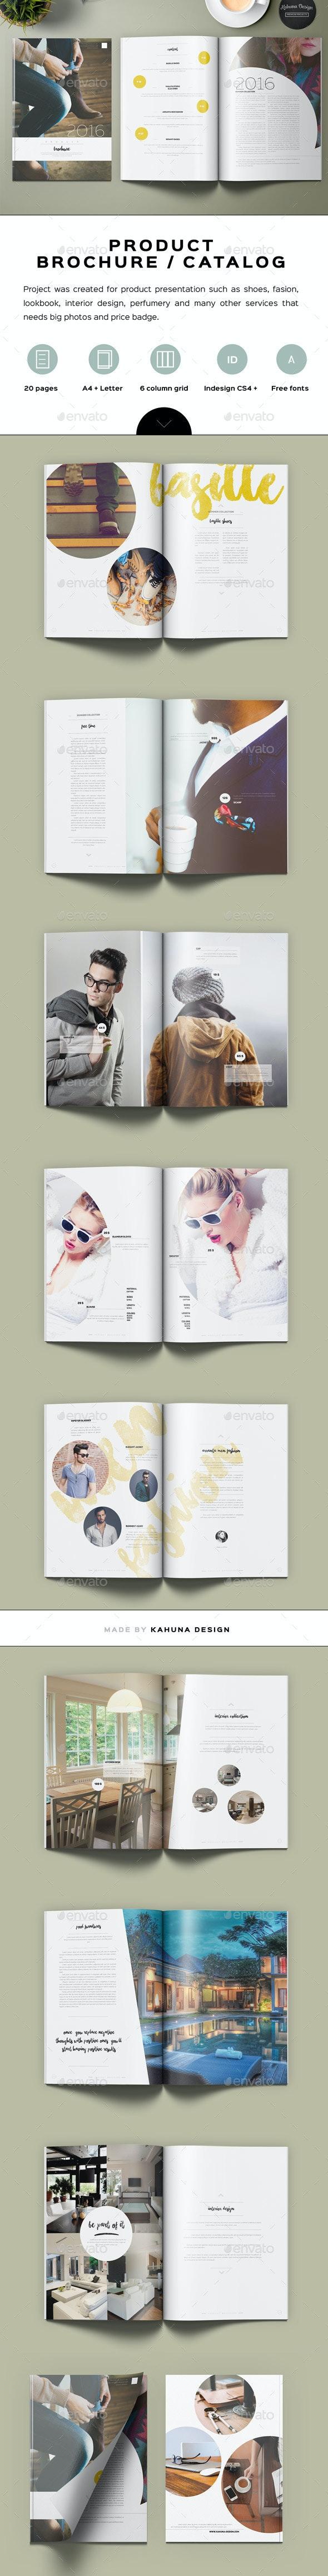 Product Brochure / Catalog - Catalogs Brochures